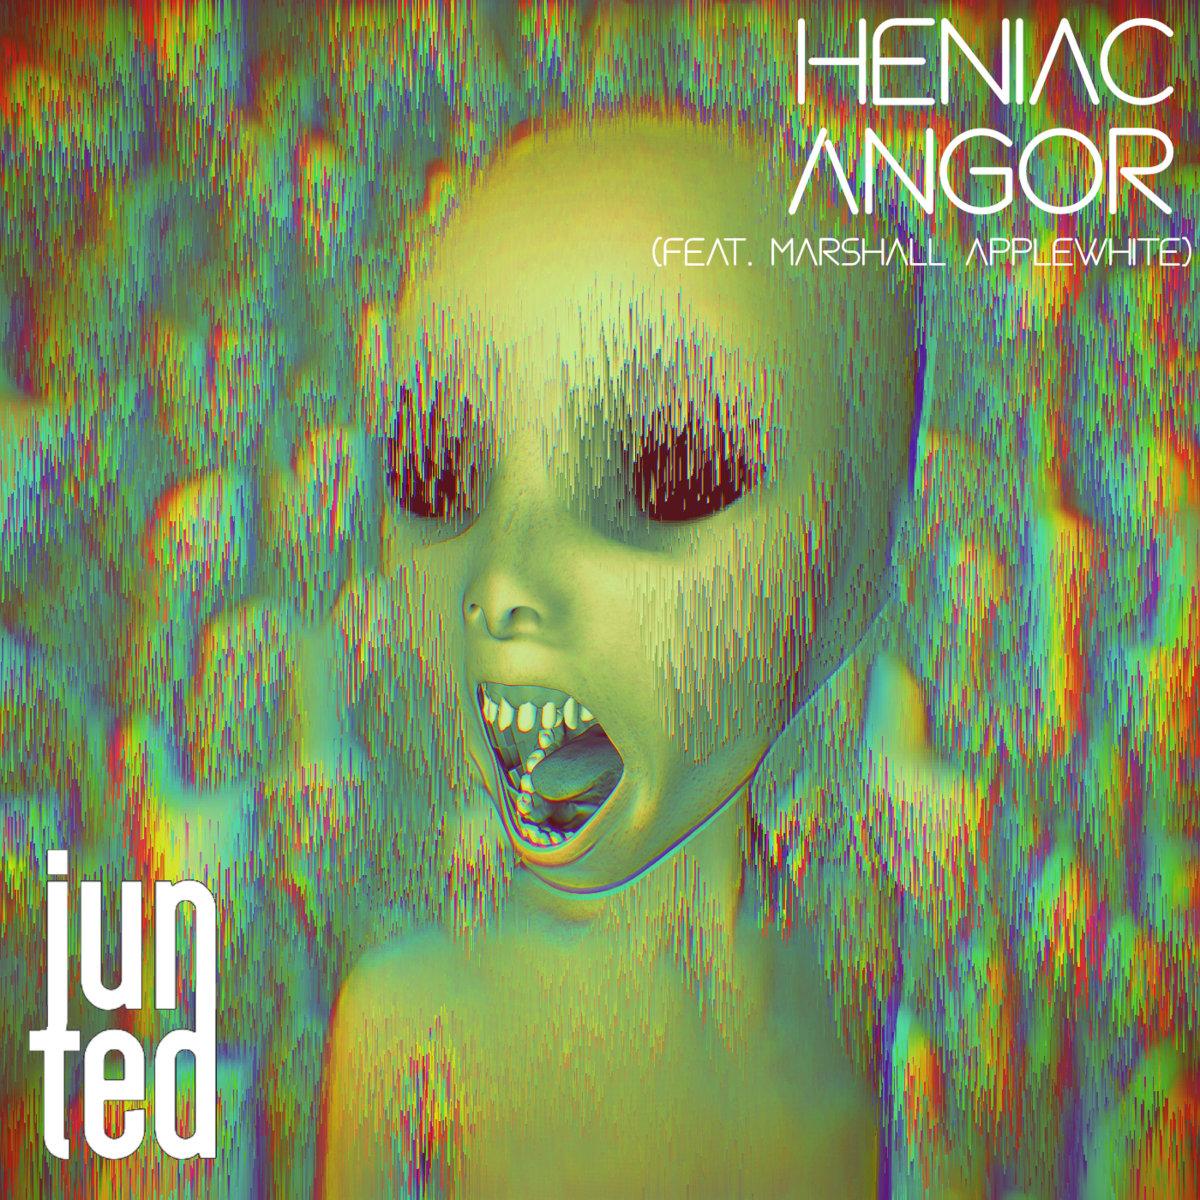 Heniac – Angor